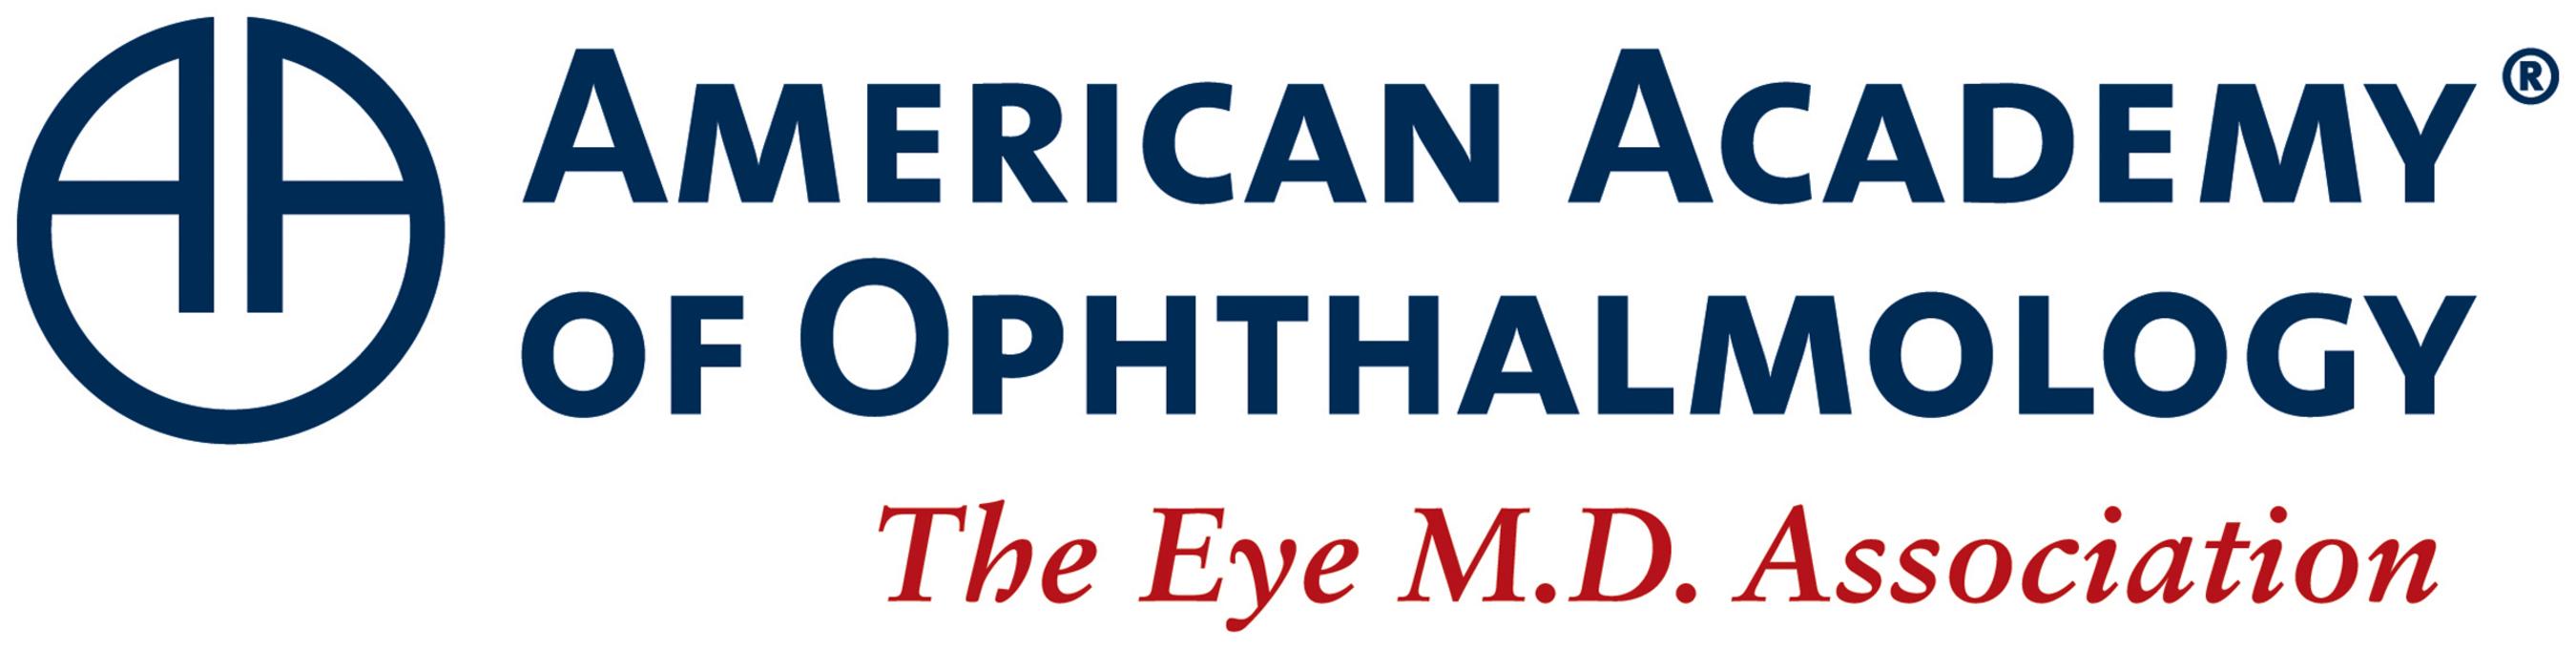 American Academy of Ophthalmology Logo.